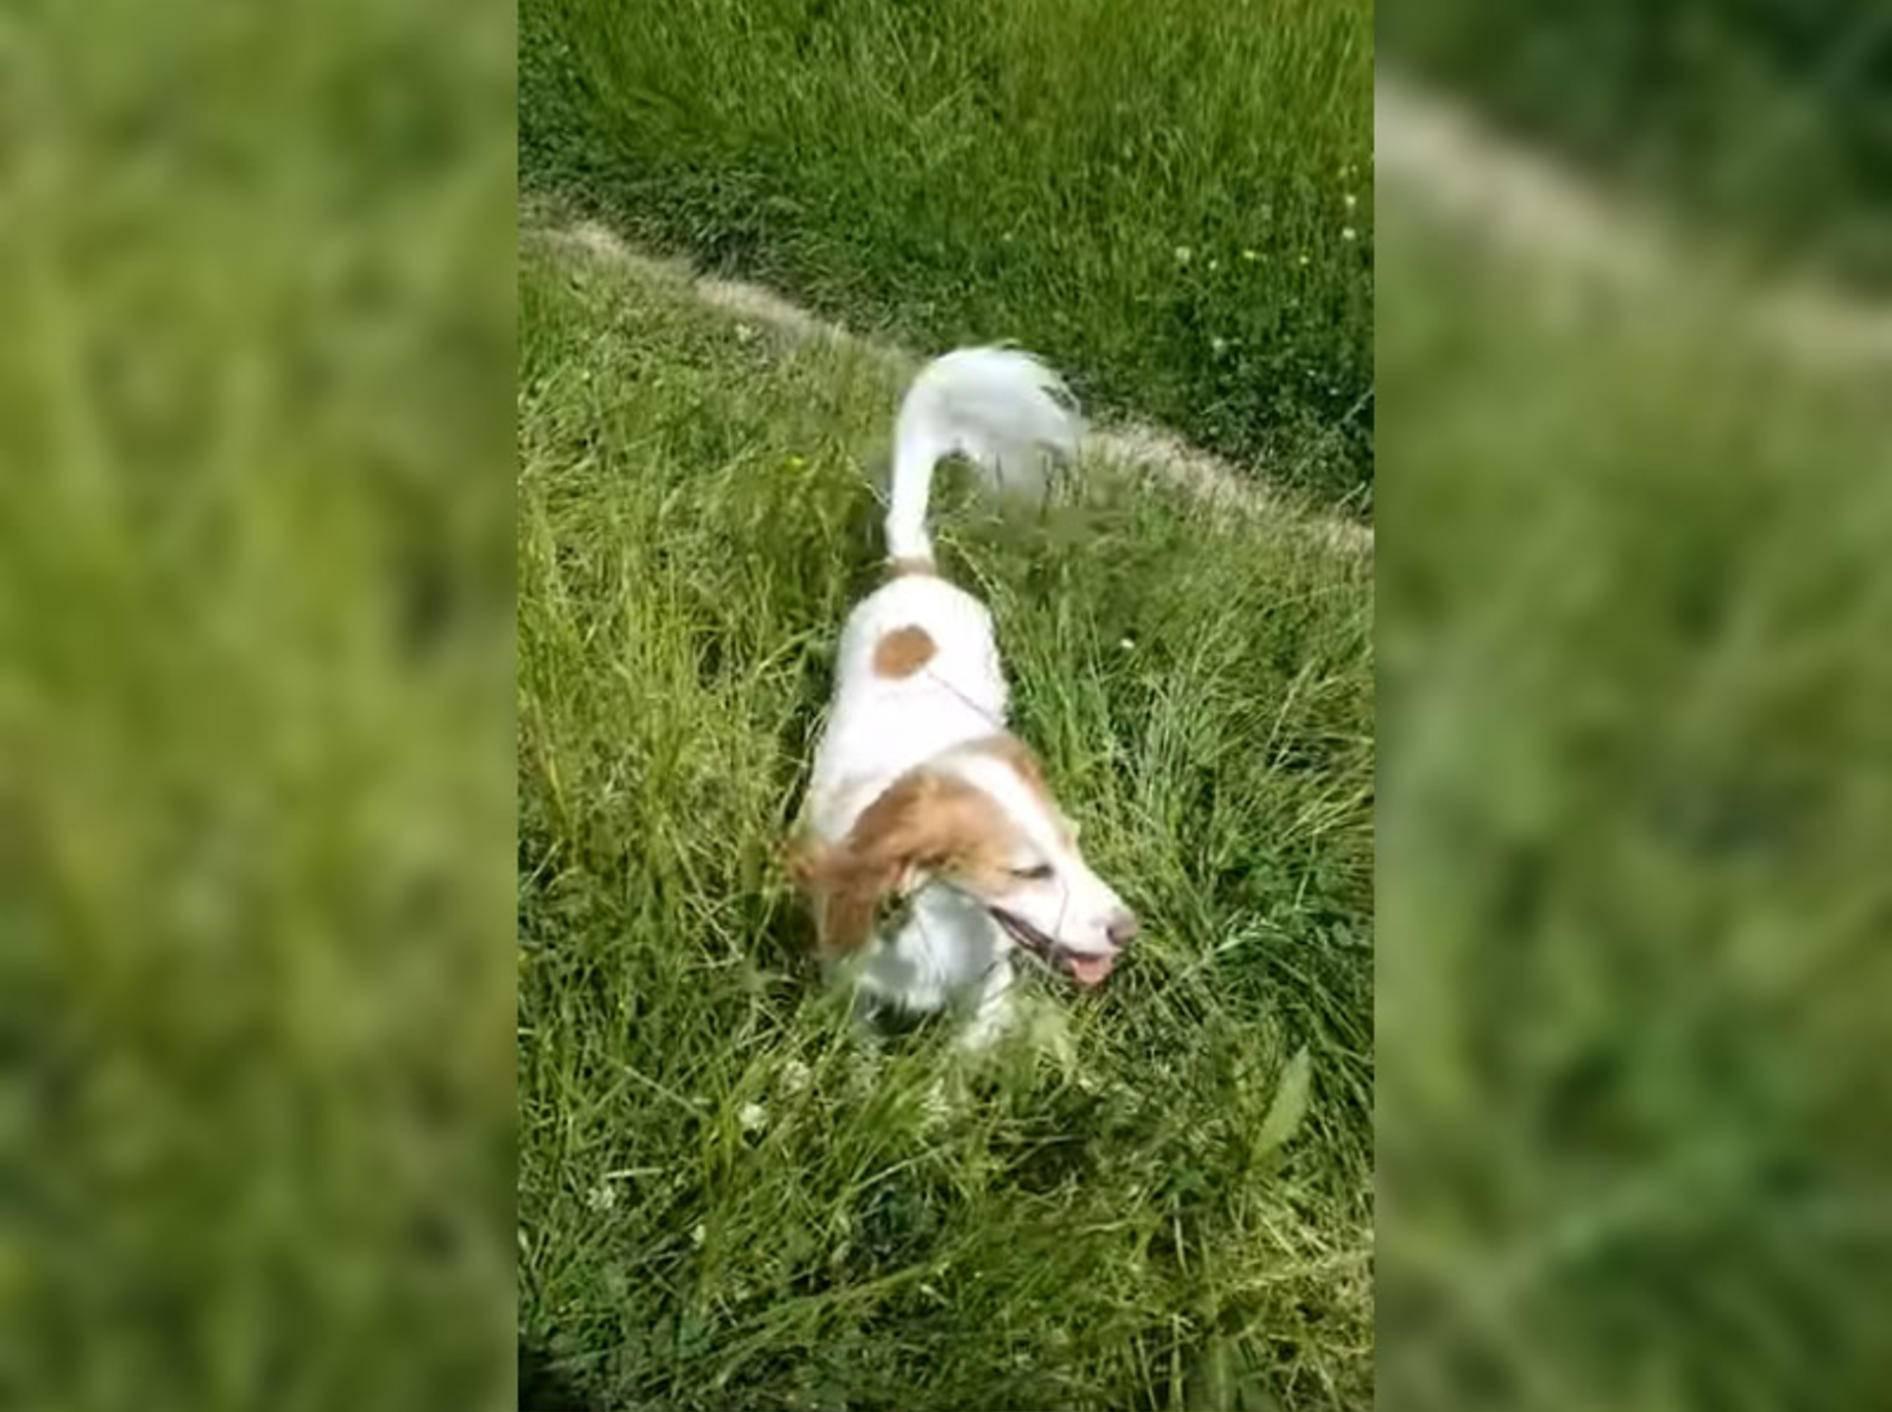 Diese süße Fellnase hat Spaß im Getreidefeld - Bild: YouTube / ViralHog